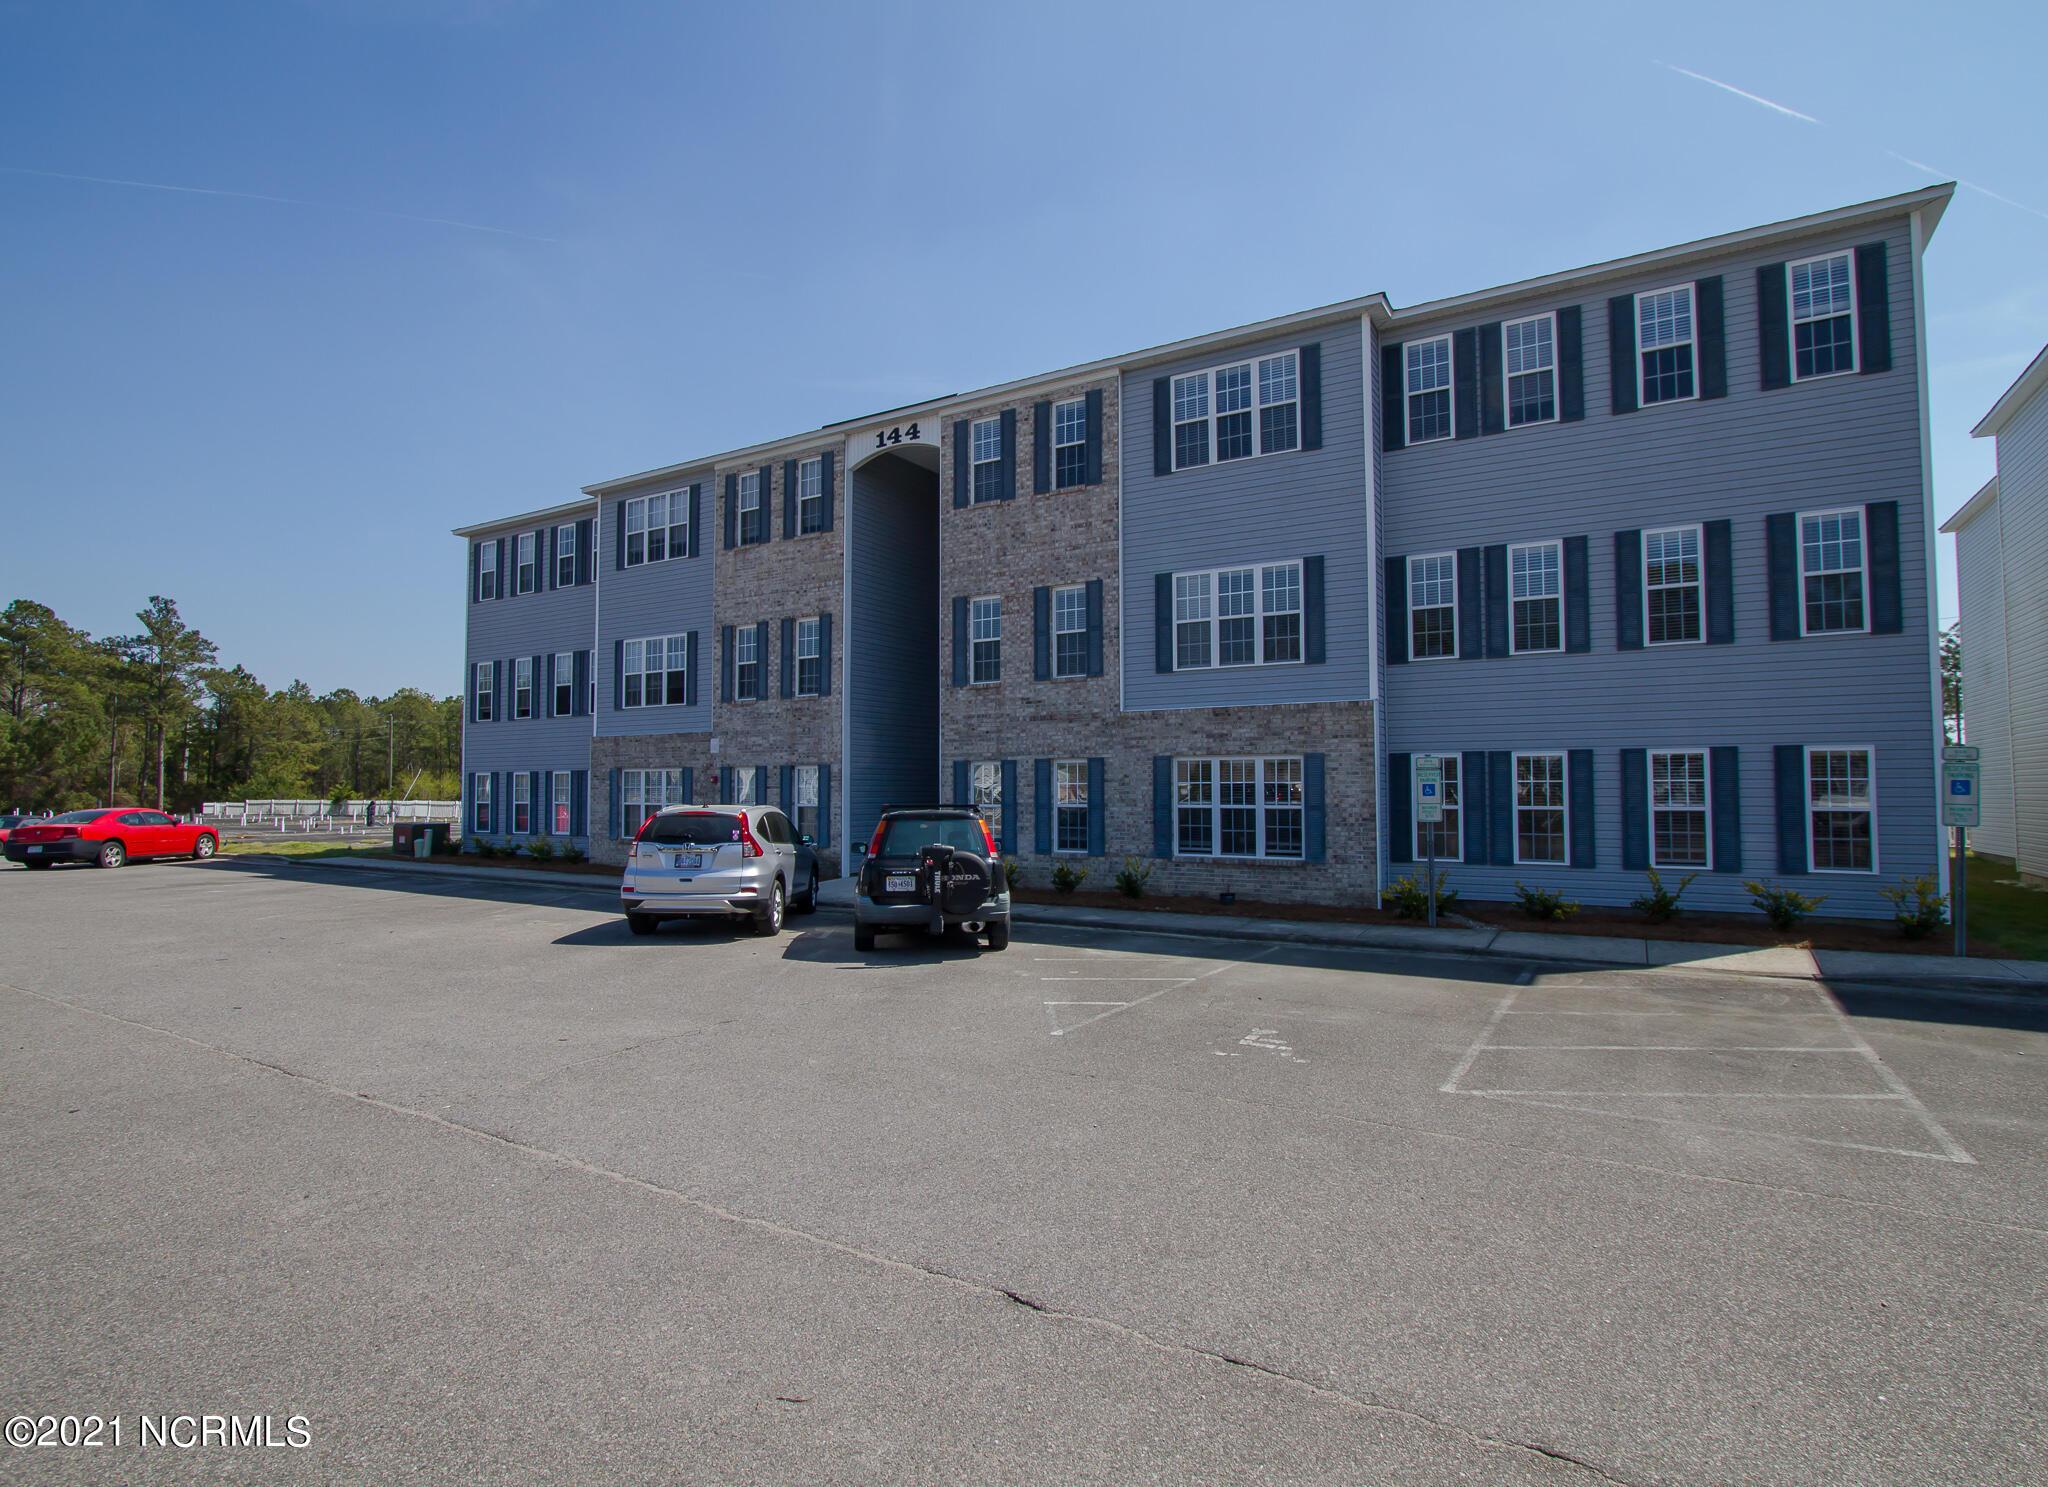 144 Hines Street, Holly Ridge, North Carolina 28445, 3 Bedrooms Bedrooms, 7 Rooms Rooms,2 BathroomsBathrooms,Condominium,For sale,Hines,100263566